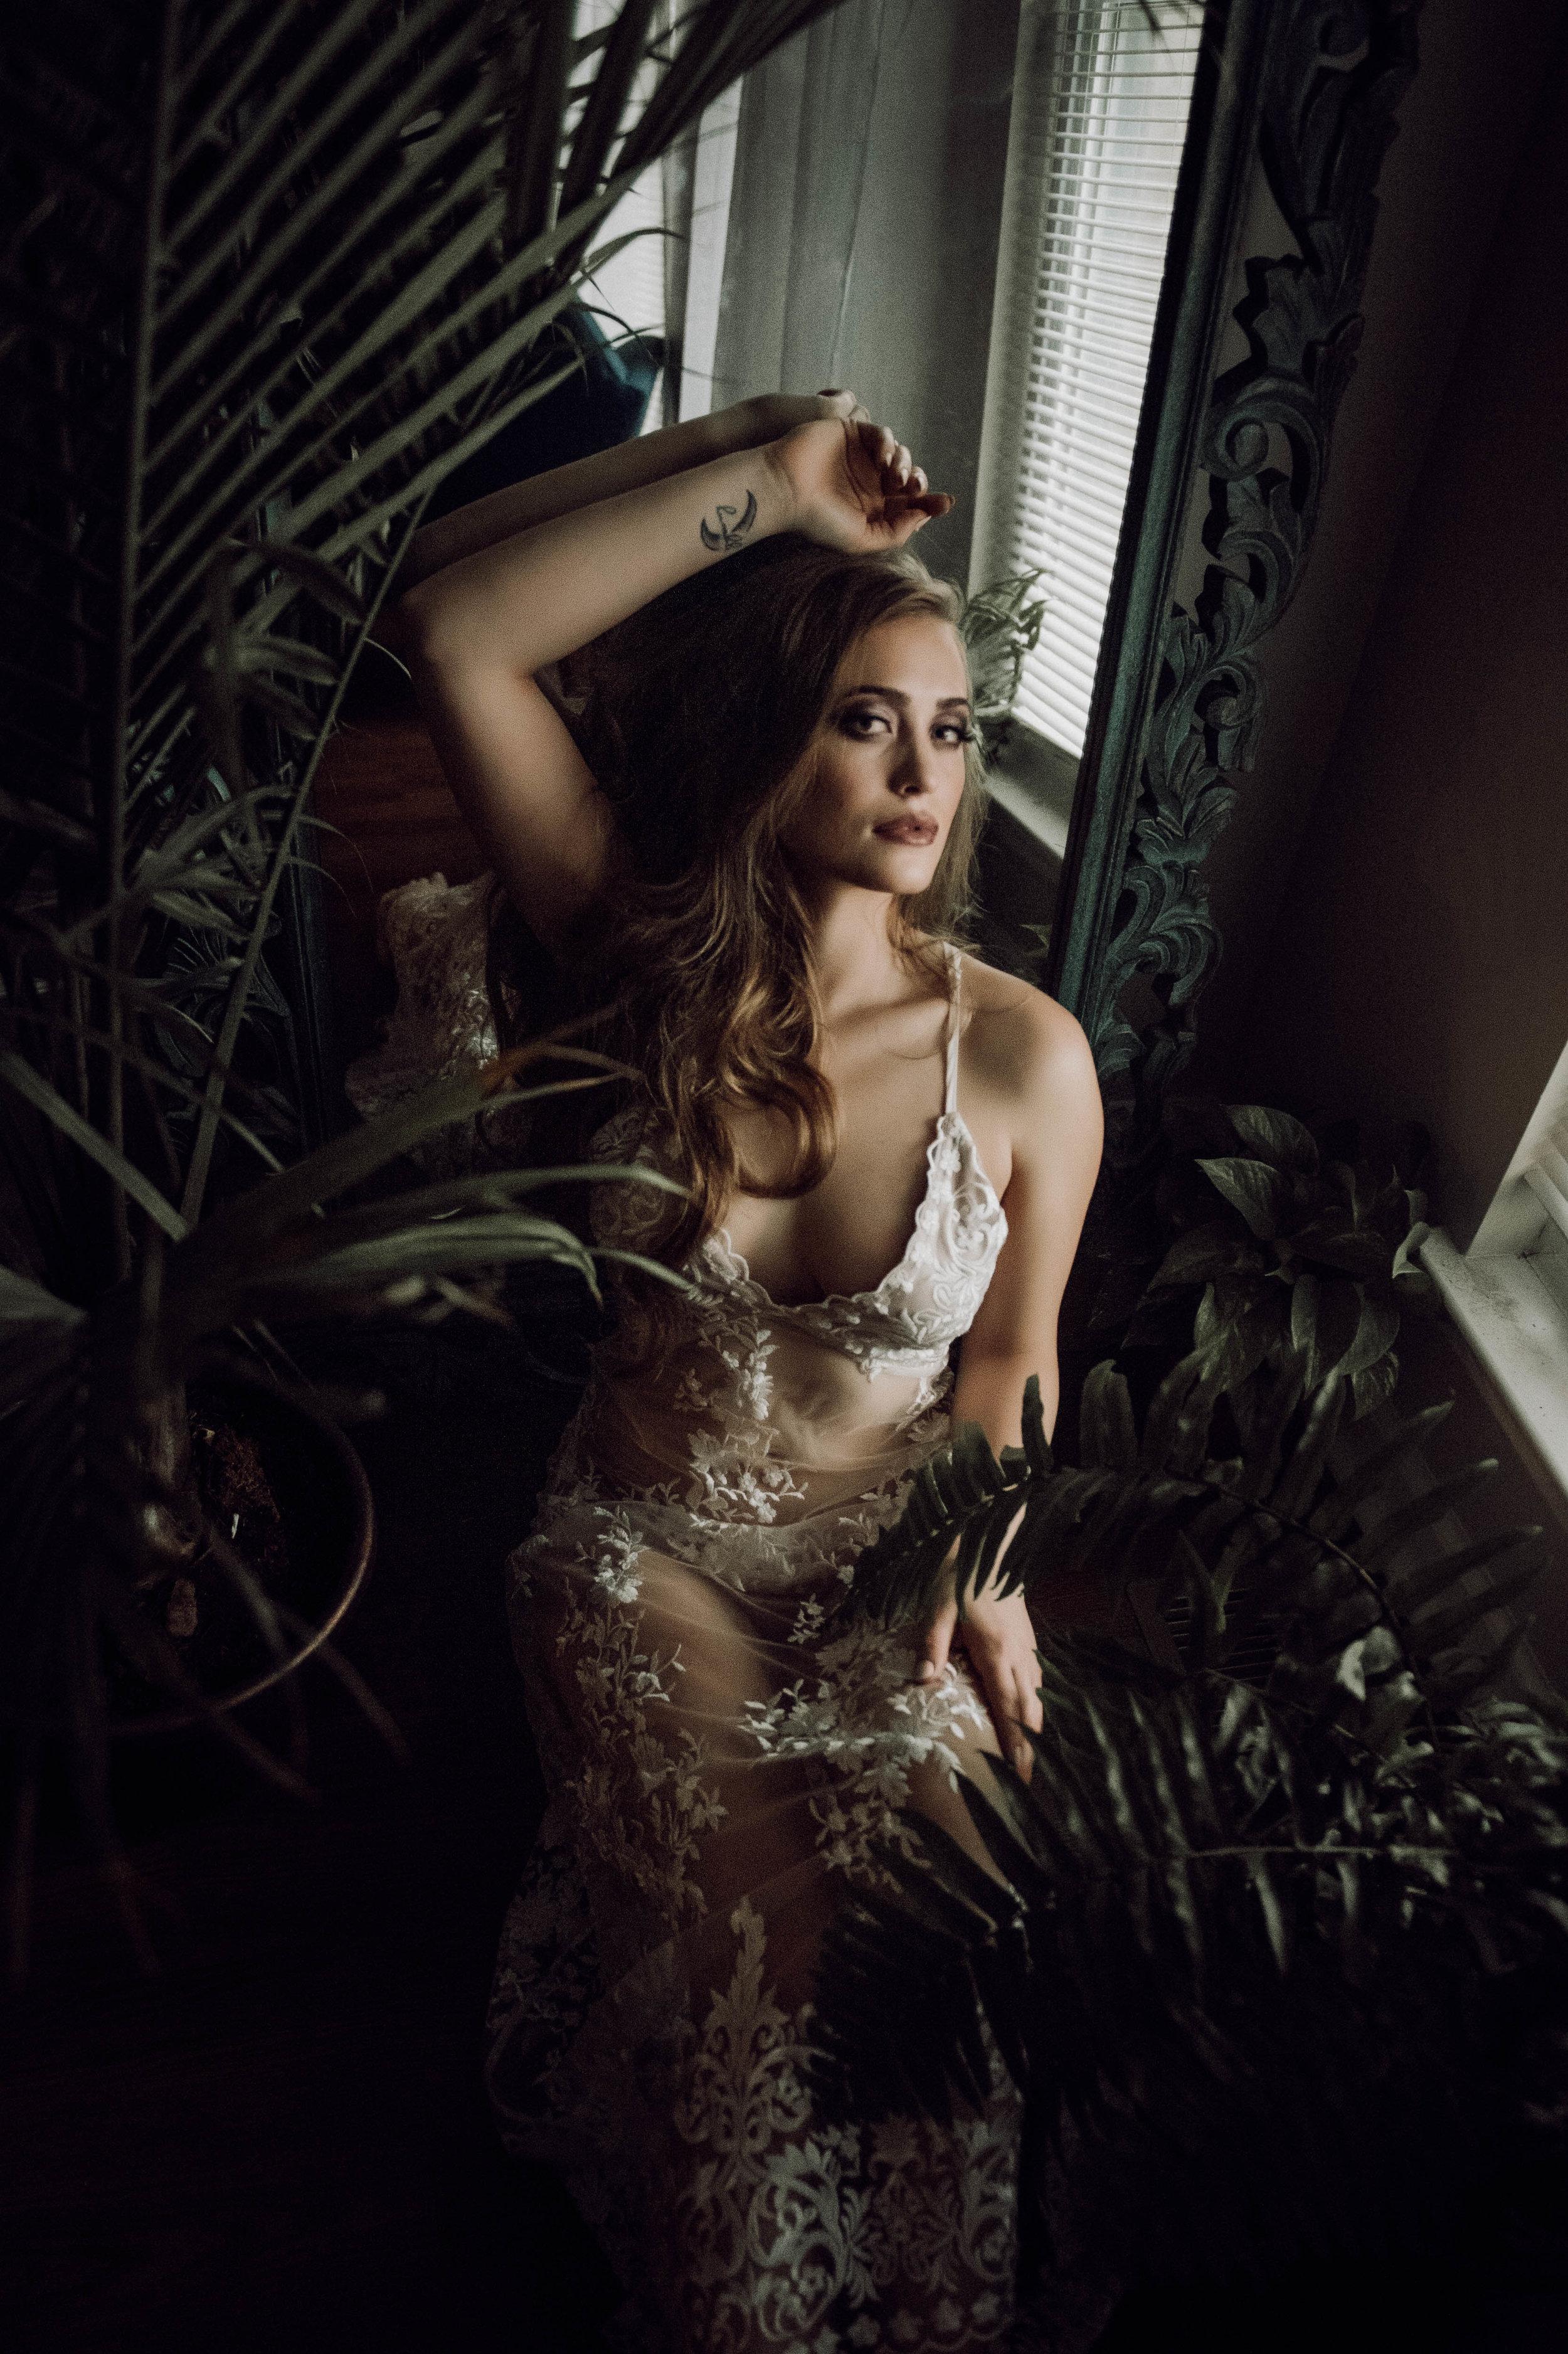 Beautiful blonde in white bodysuit mirror bedroom boudoir photography new york city studio